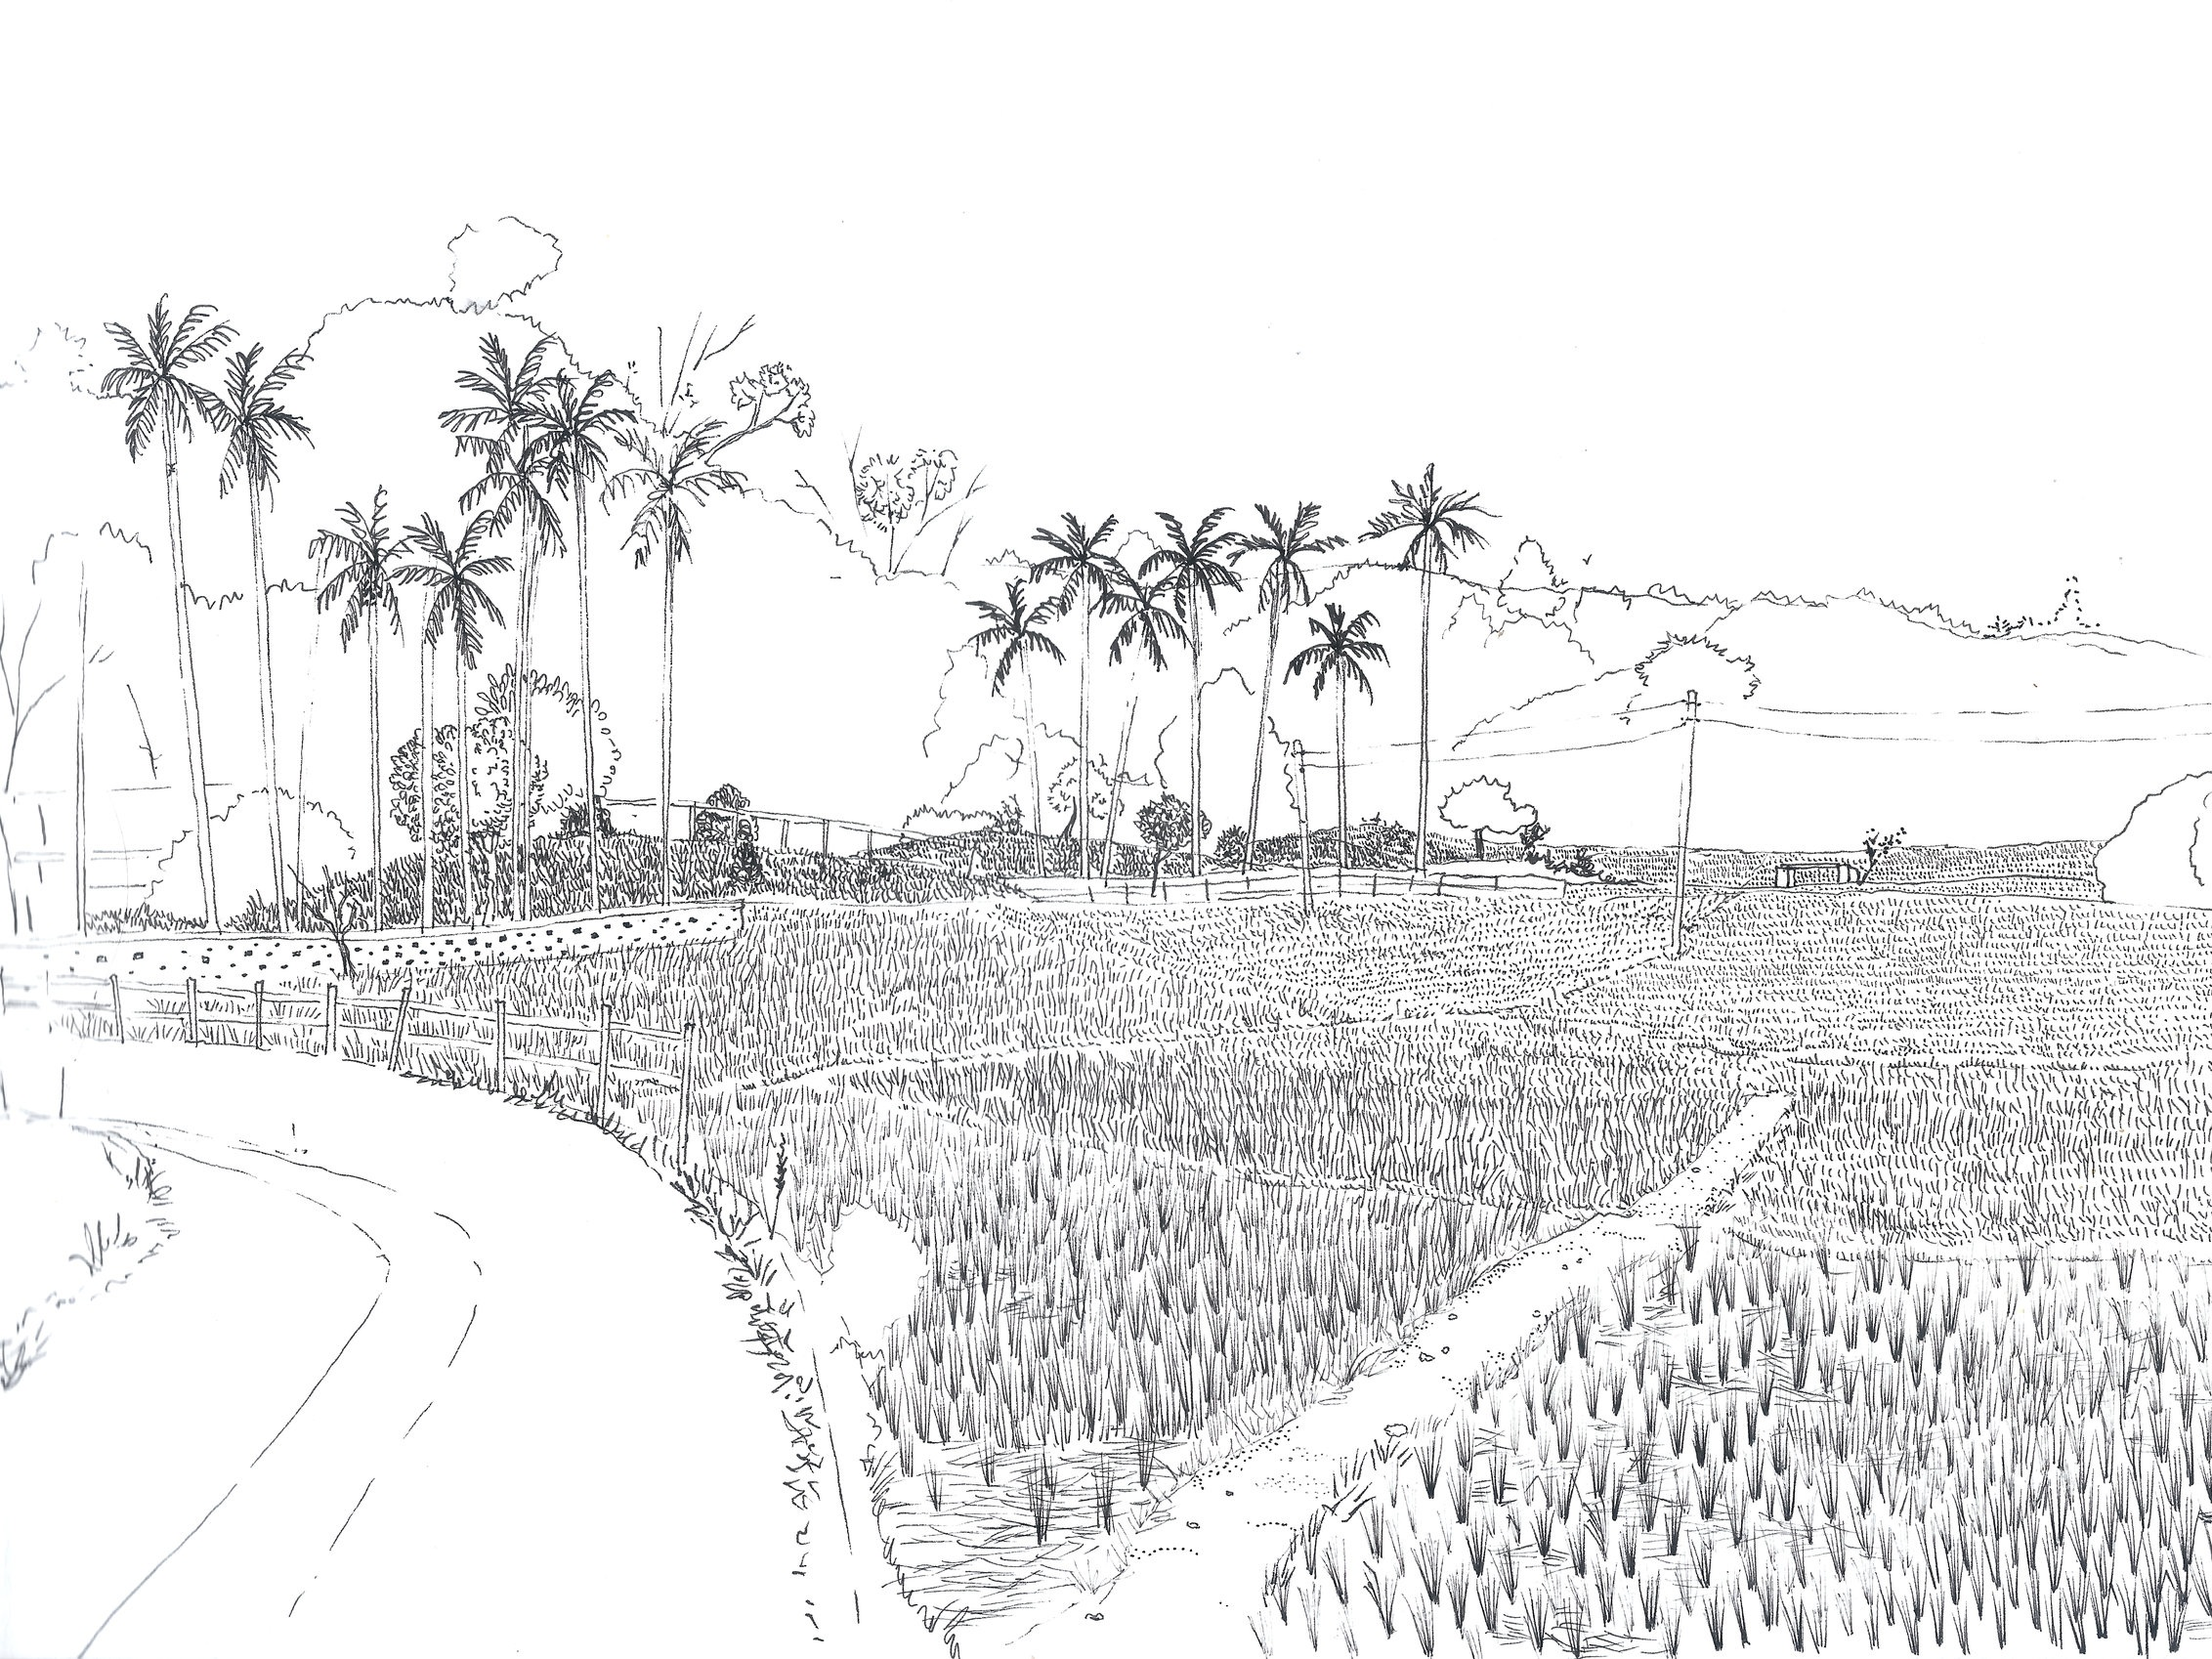 Paddy fields, Gamchakobra village, Tripura.